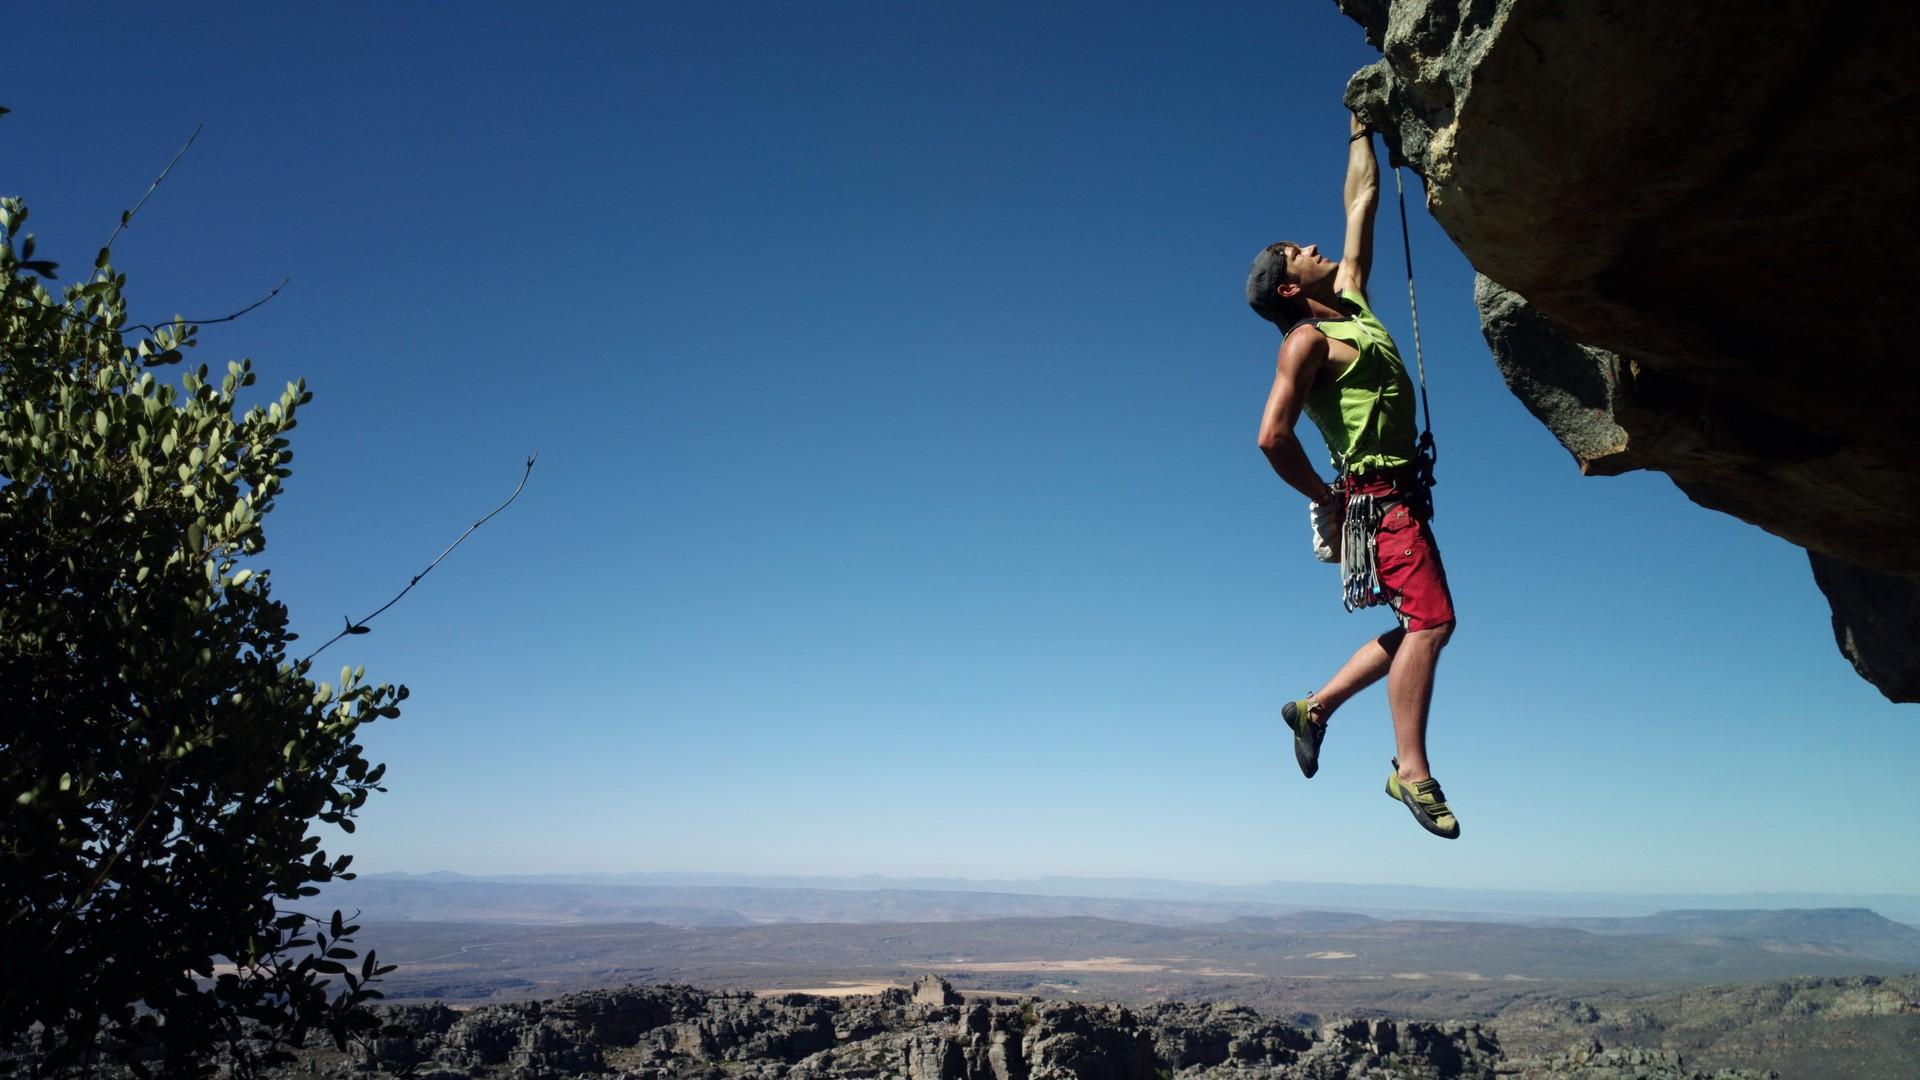 rock climbing wallpaper pictures 56286